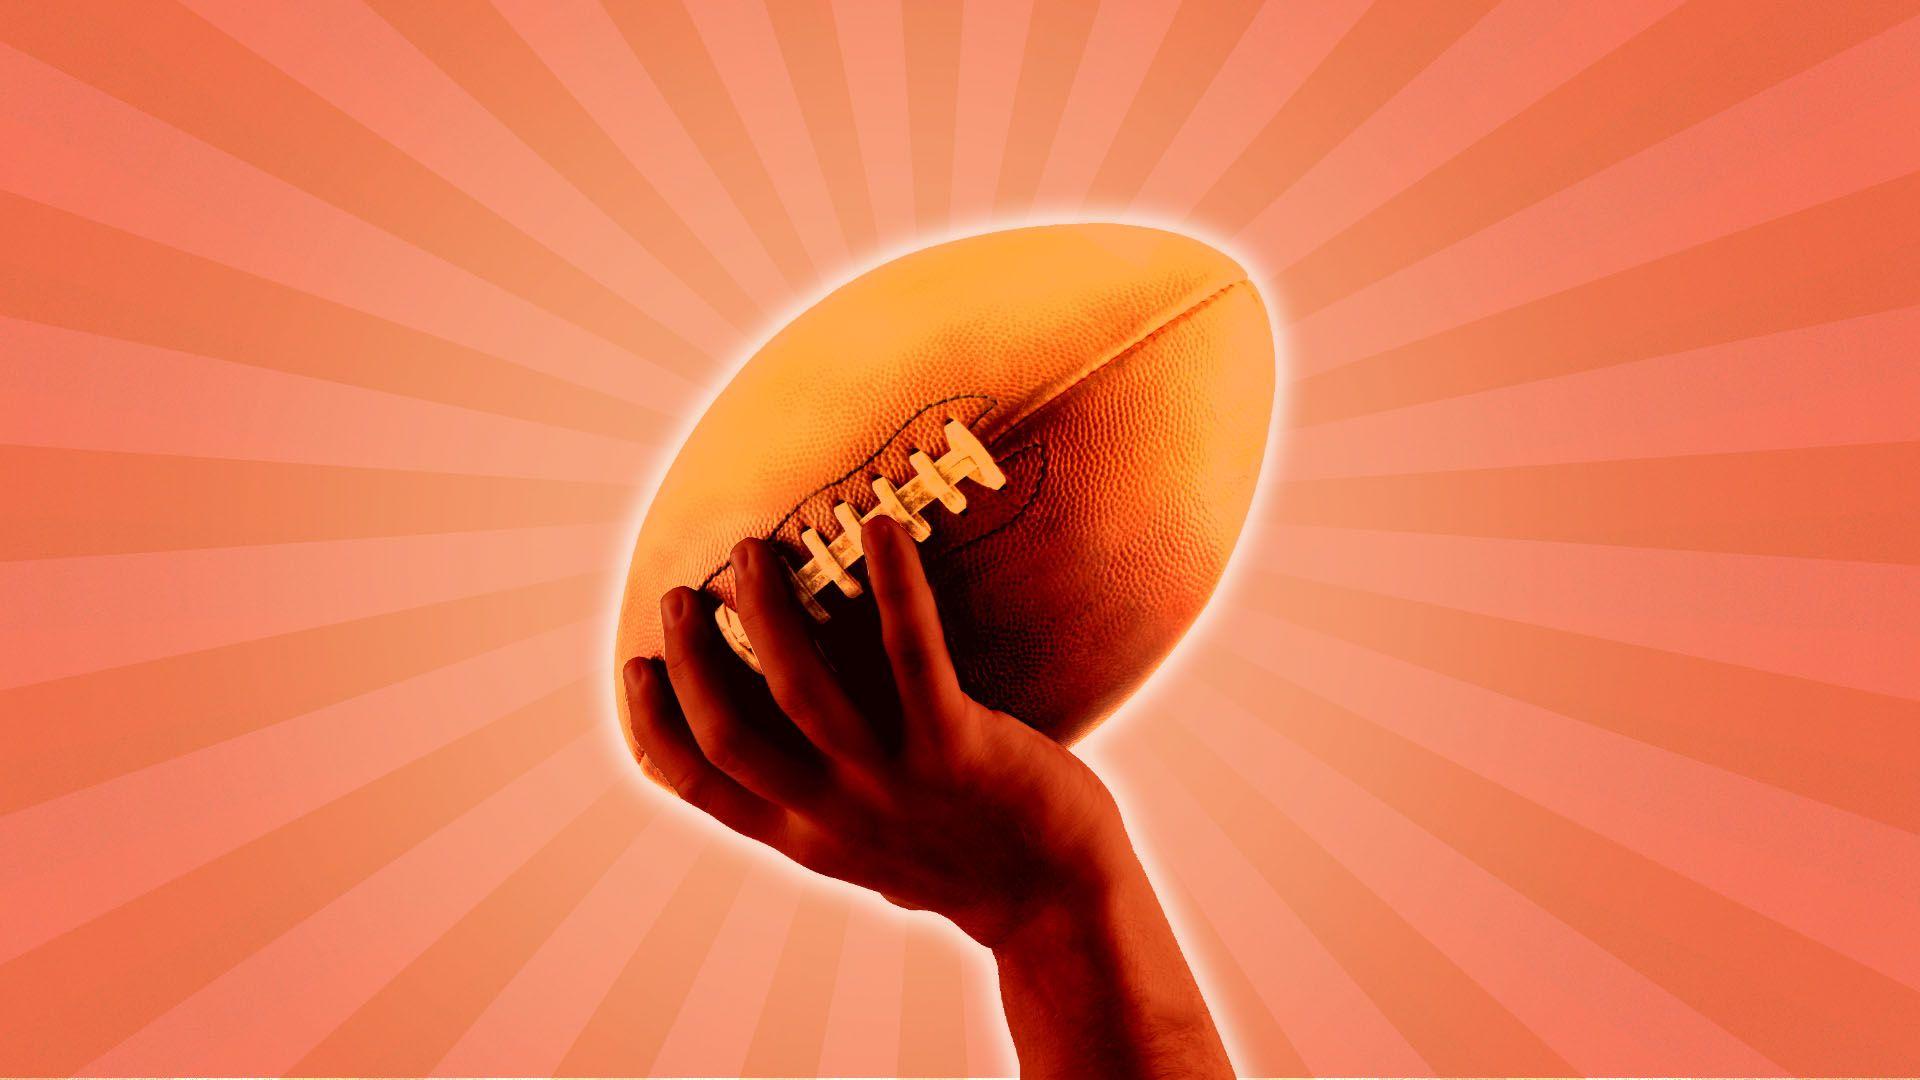 Illustration of hand holding up football